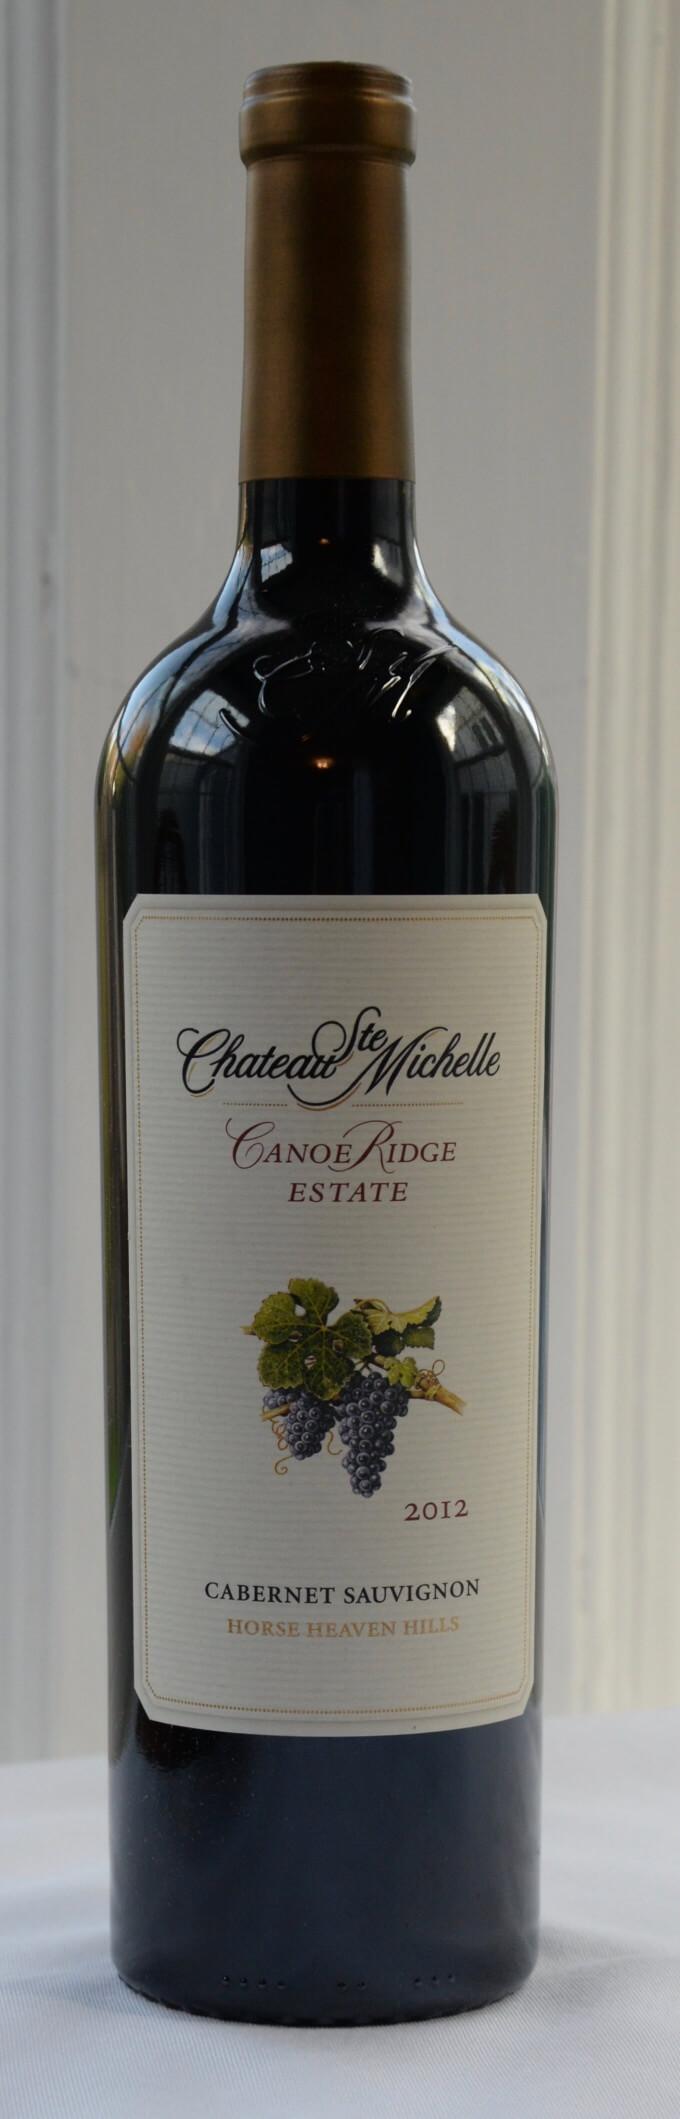 2012 Chateau Ste. Michelle Canoe Ridge Estate Cabernet Sauvignon Horse Heaven Hills